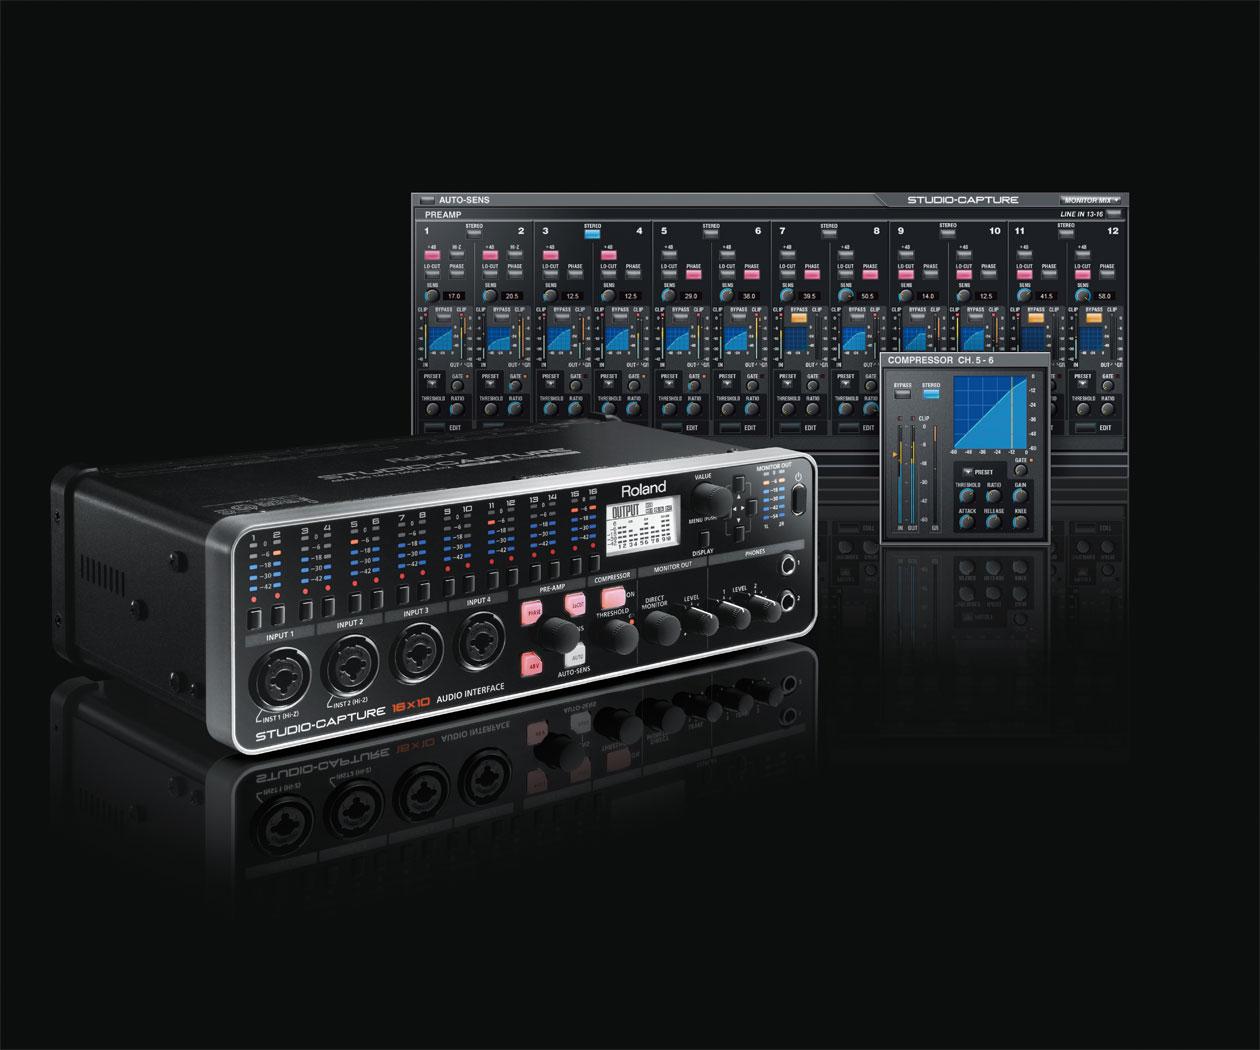 Roland Studio Capture Usb 20 Audio Interface Xlr Wiring Block Diagram Visio